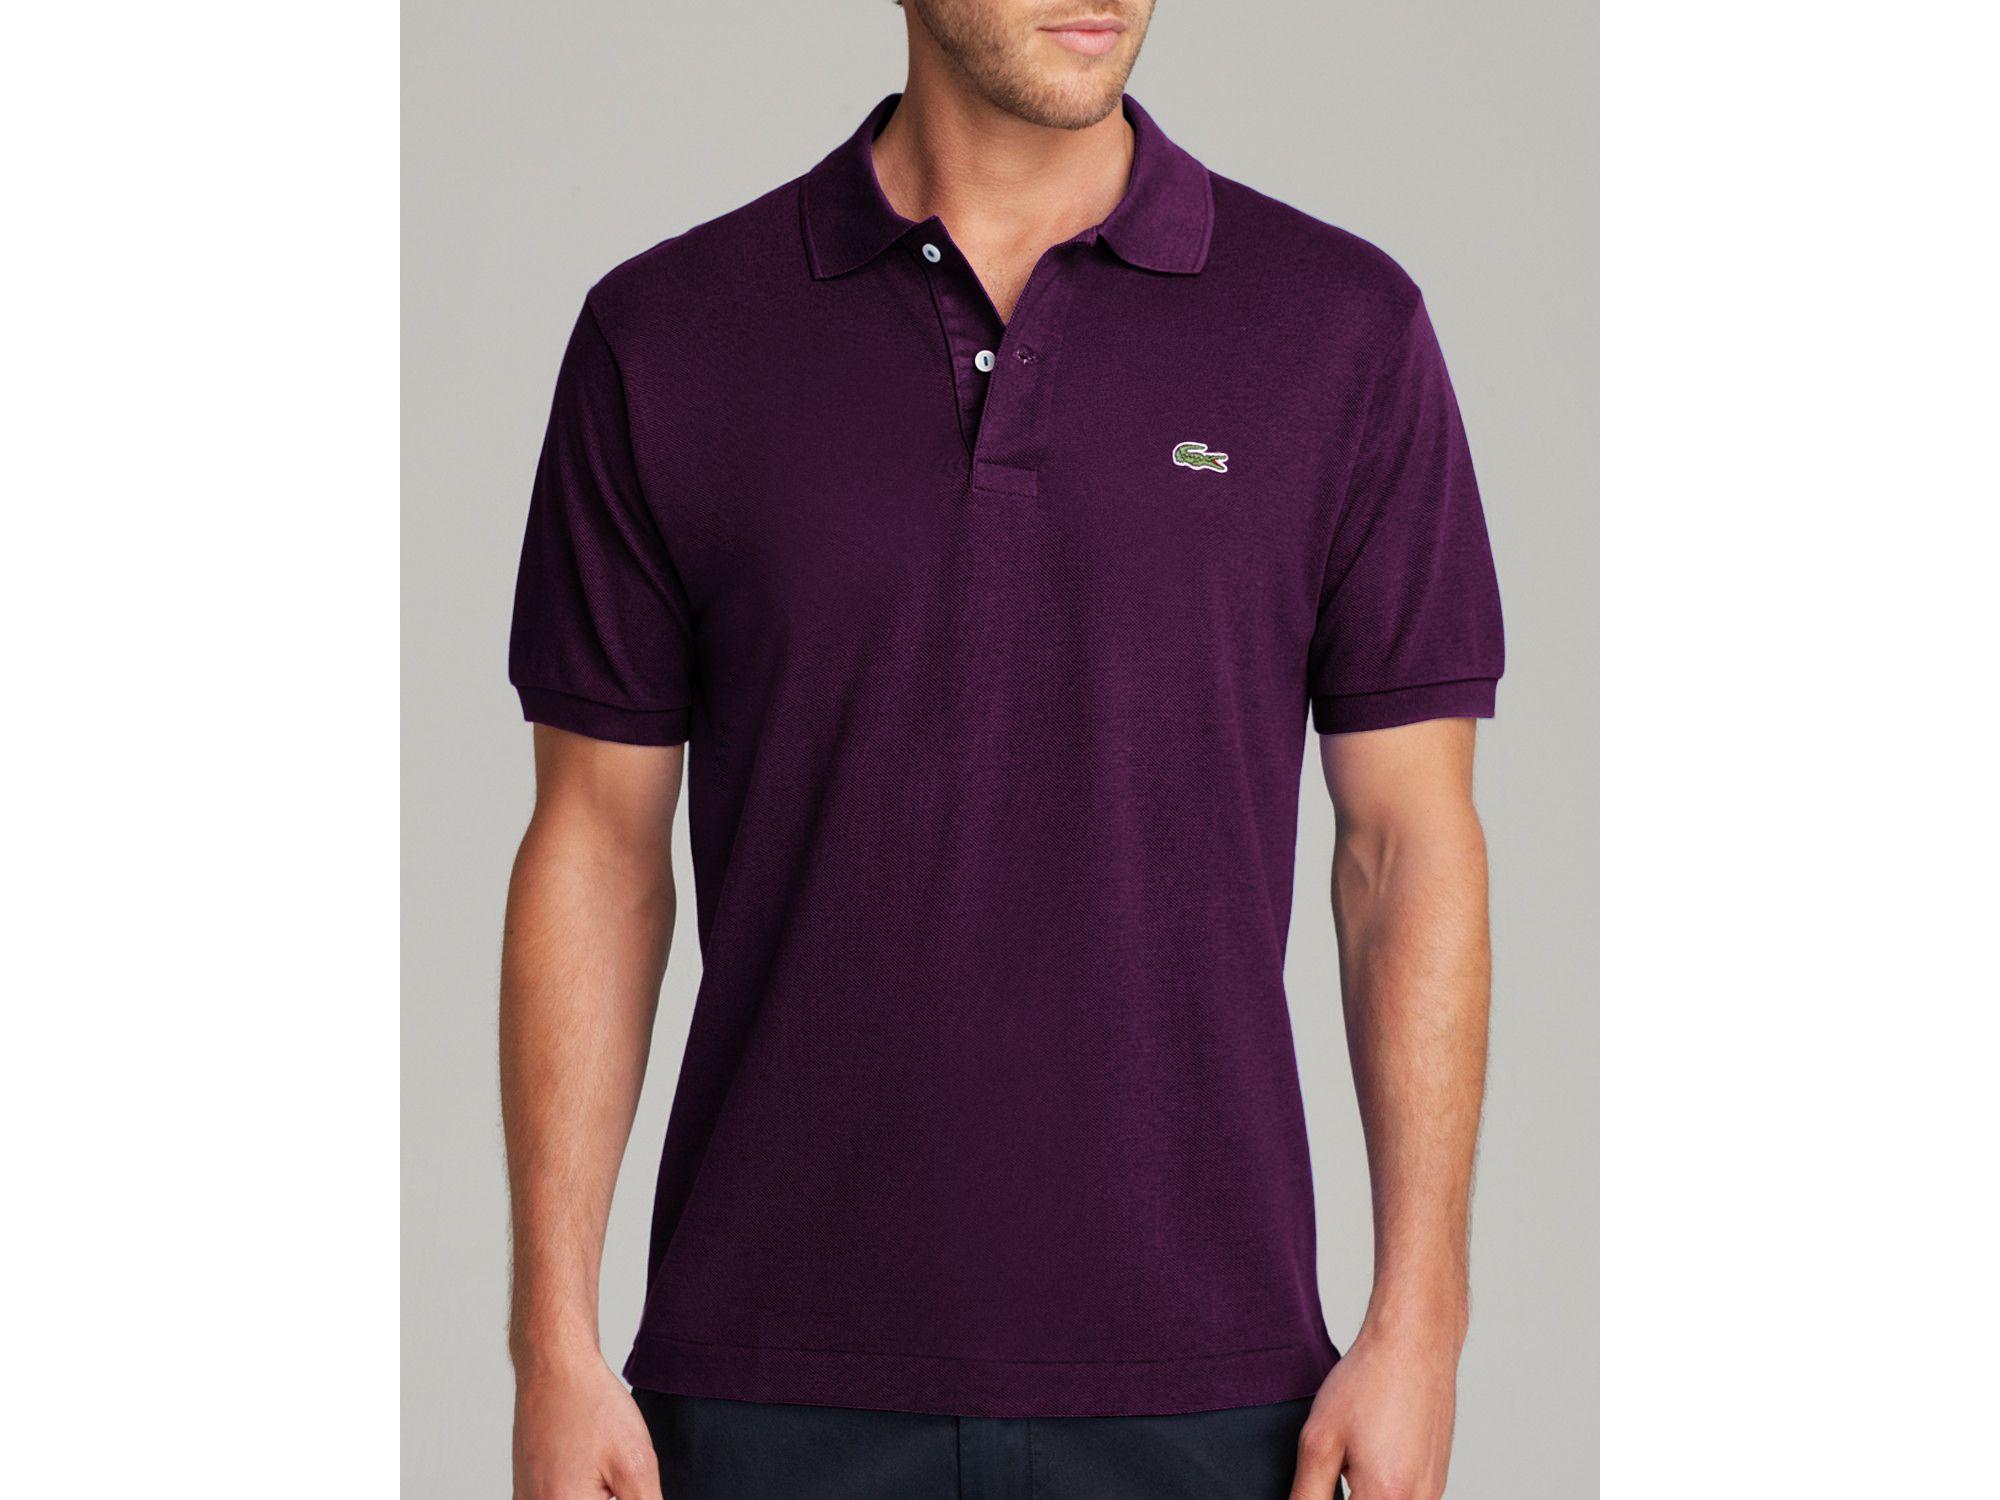 d0c2d32a10 Lacoste Classic Fit Polo Shirt | Azərbaycan Dillər Universiteti